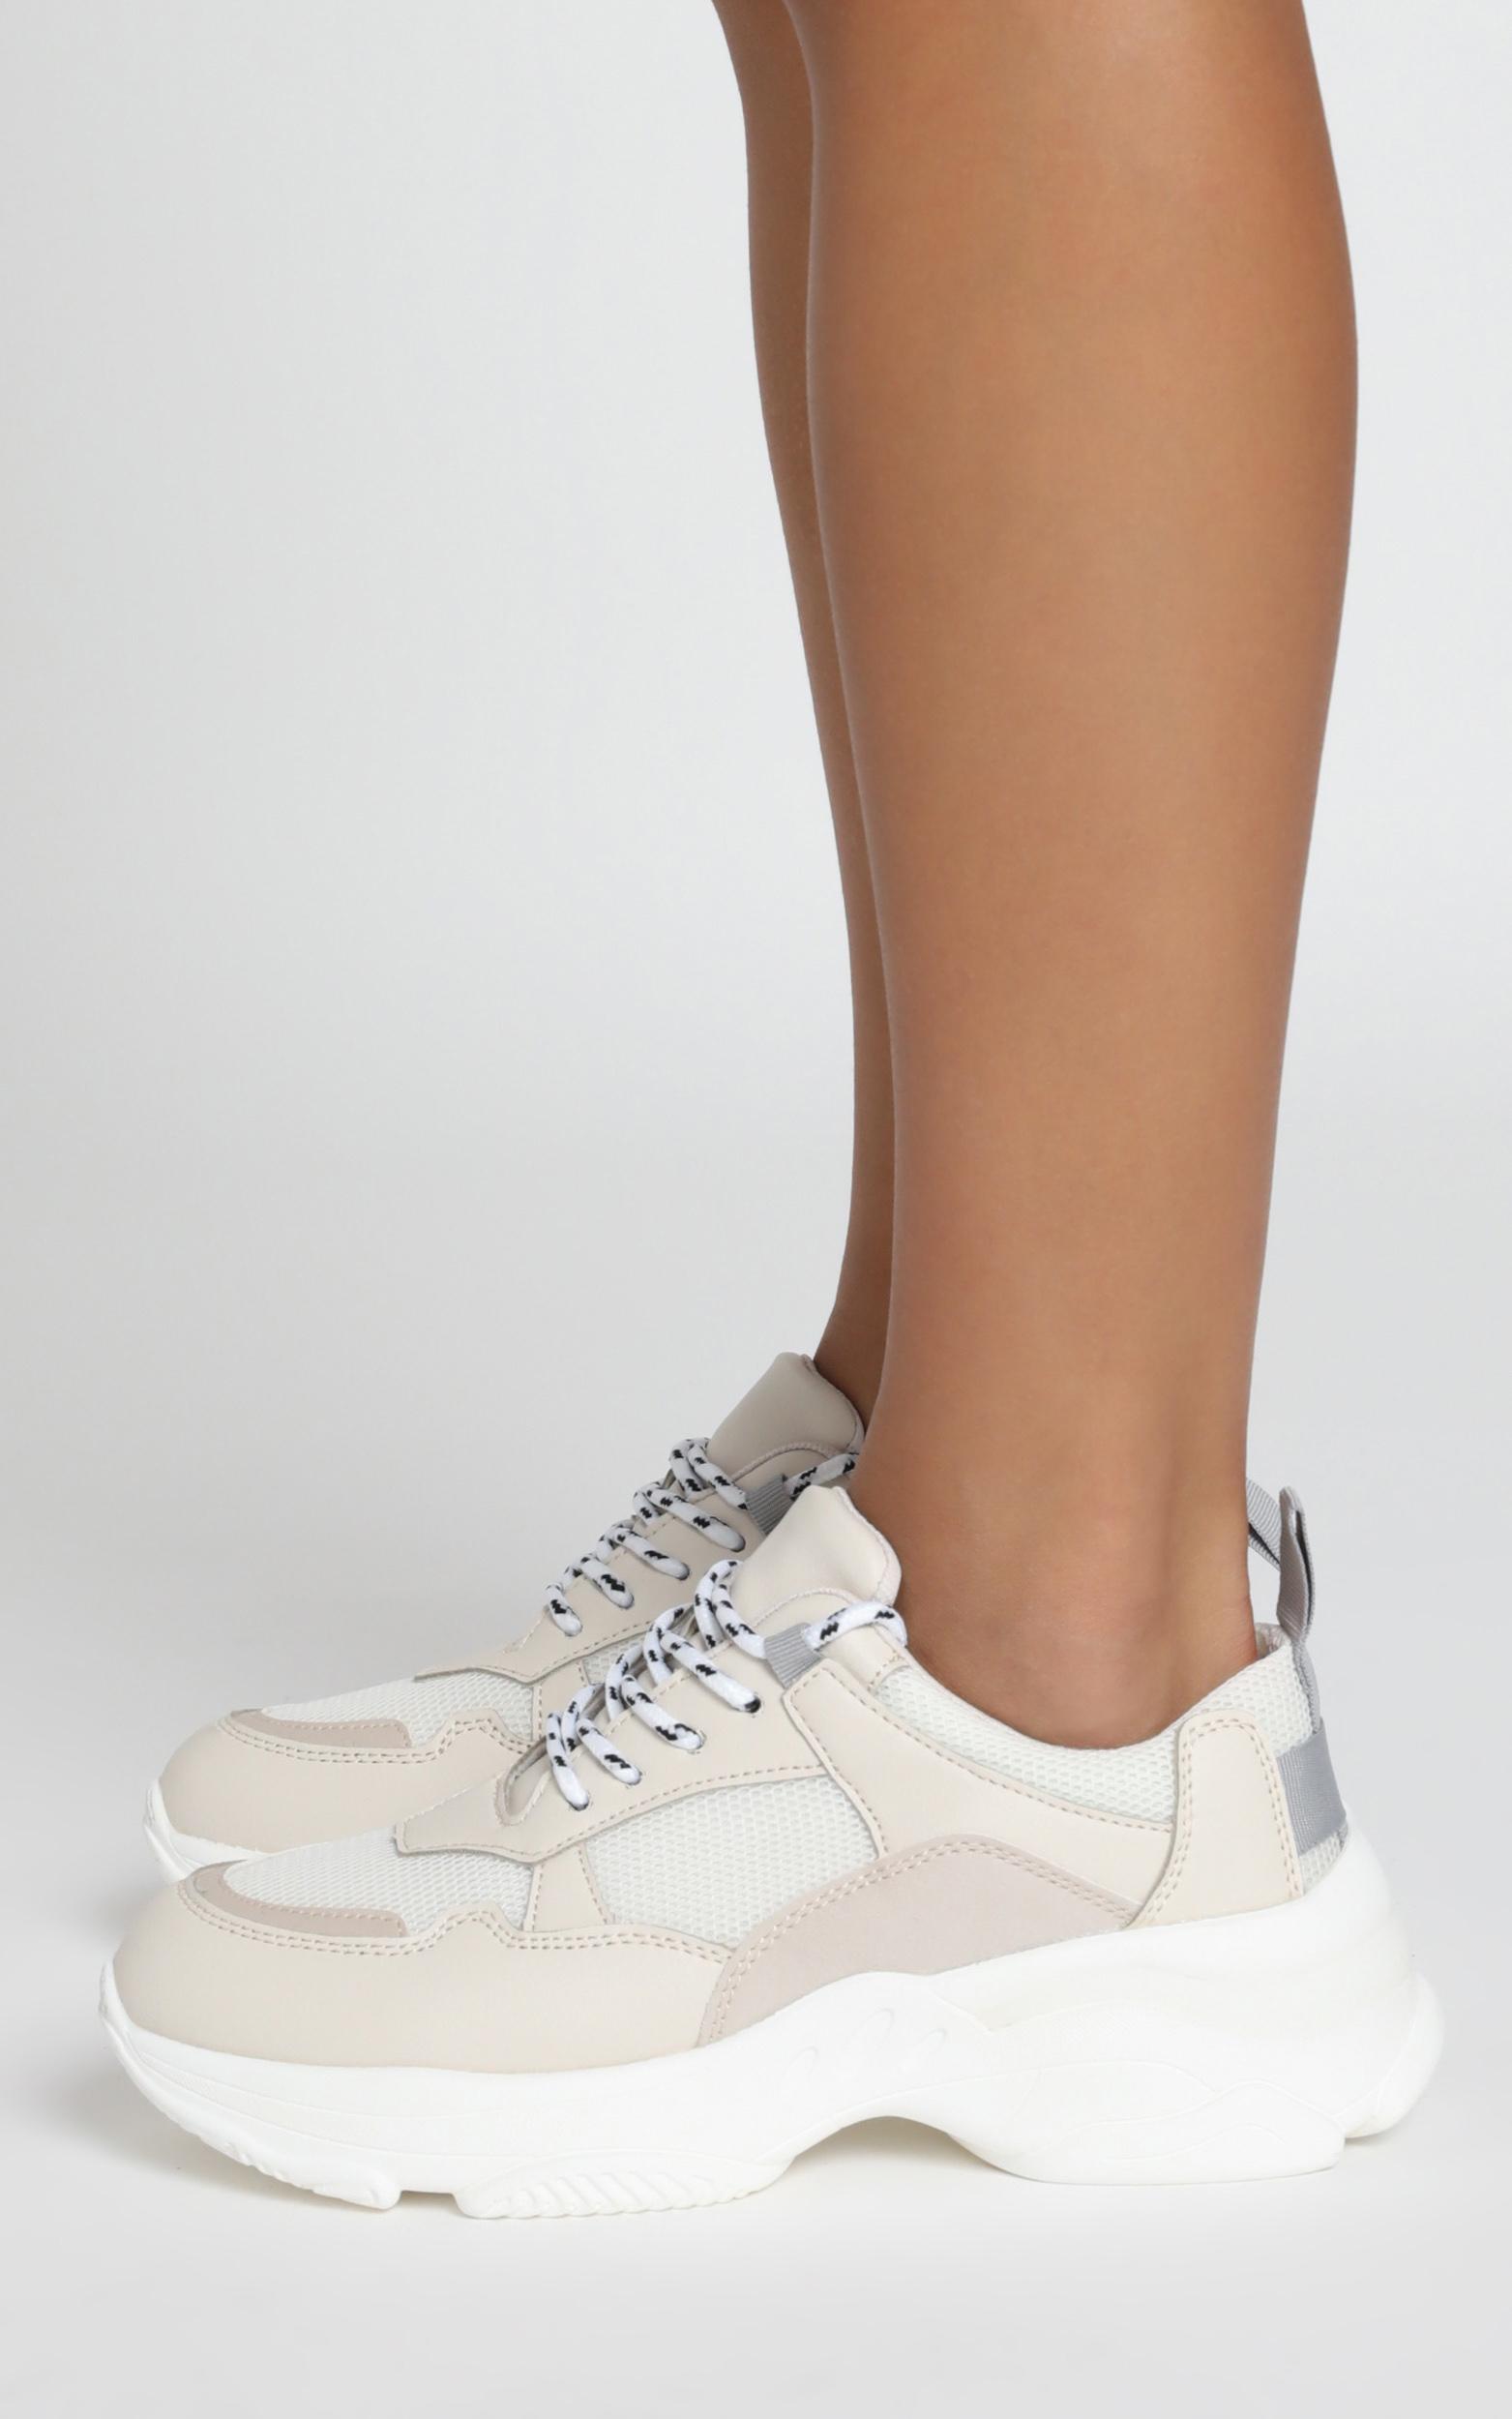 Billini - Stassi sneakers in beige - 5, Beige, hi-res image number null